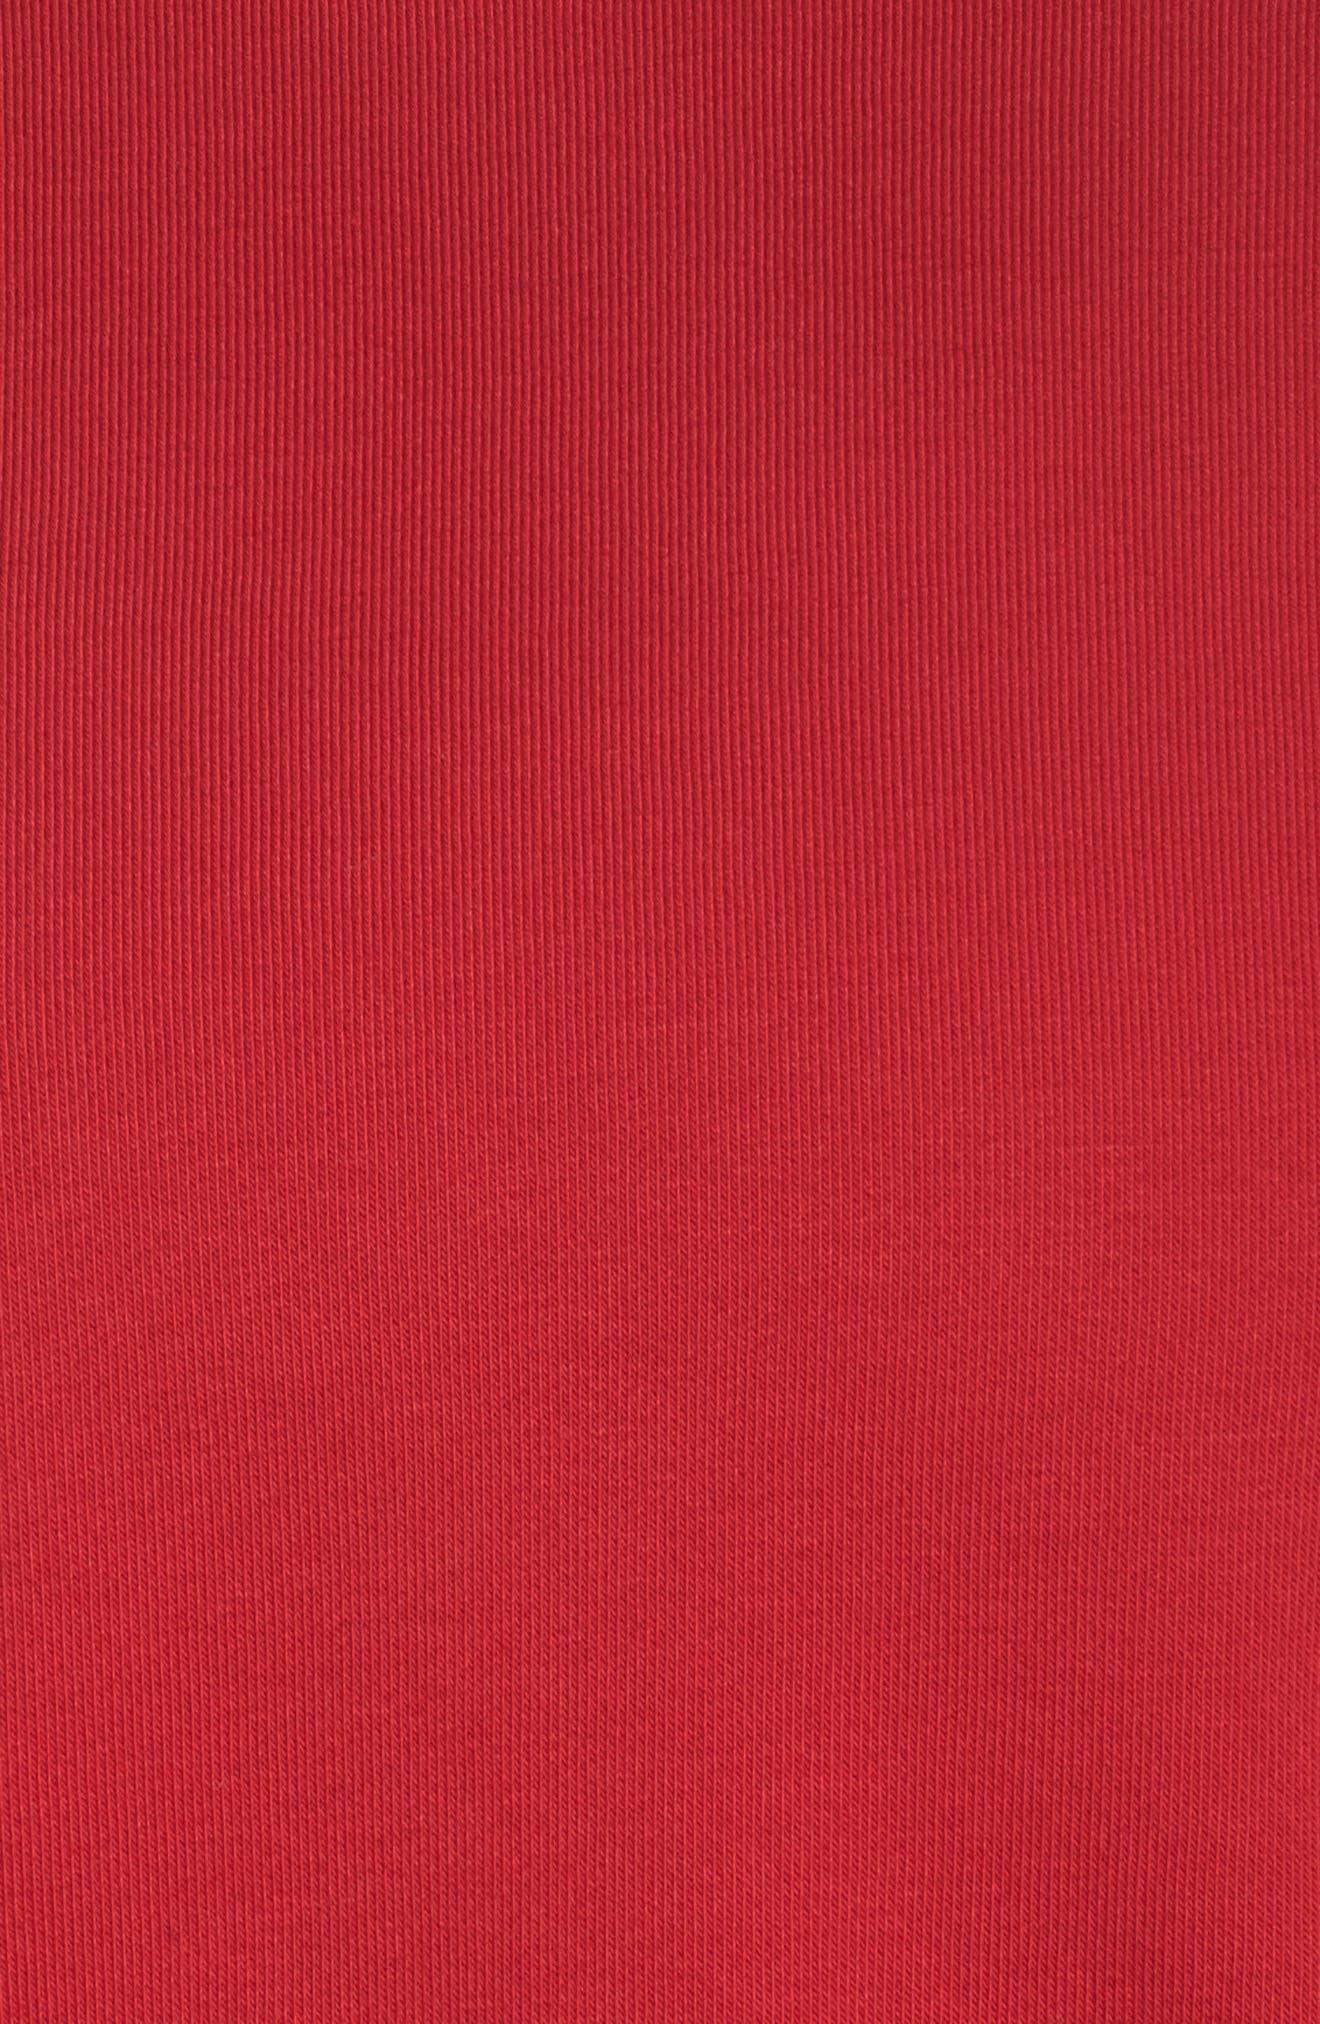 Dry Versa Training Top,                             Alternate thumbnail 5, color,                             Gym Red/ Black